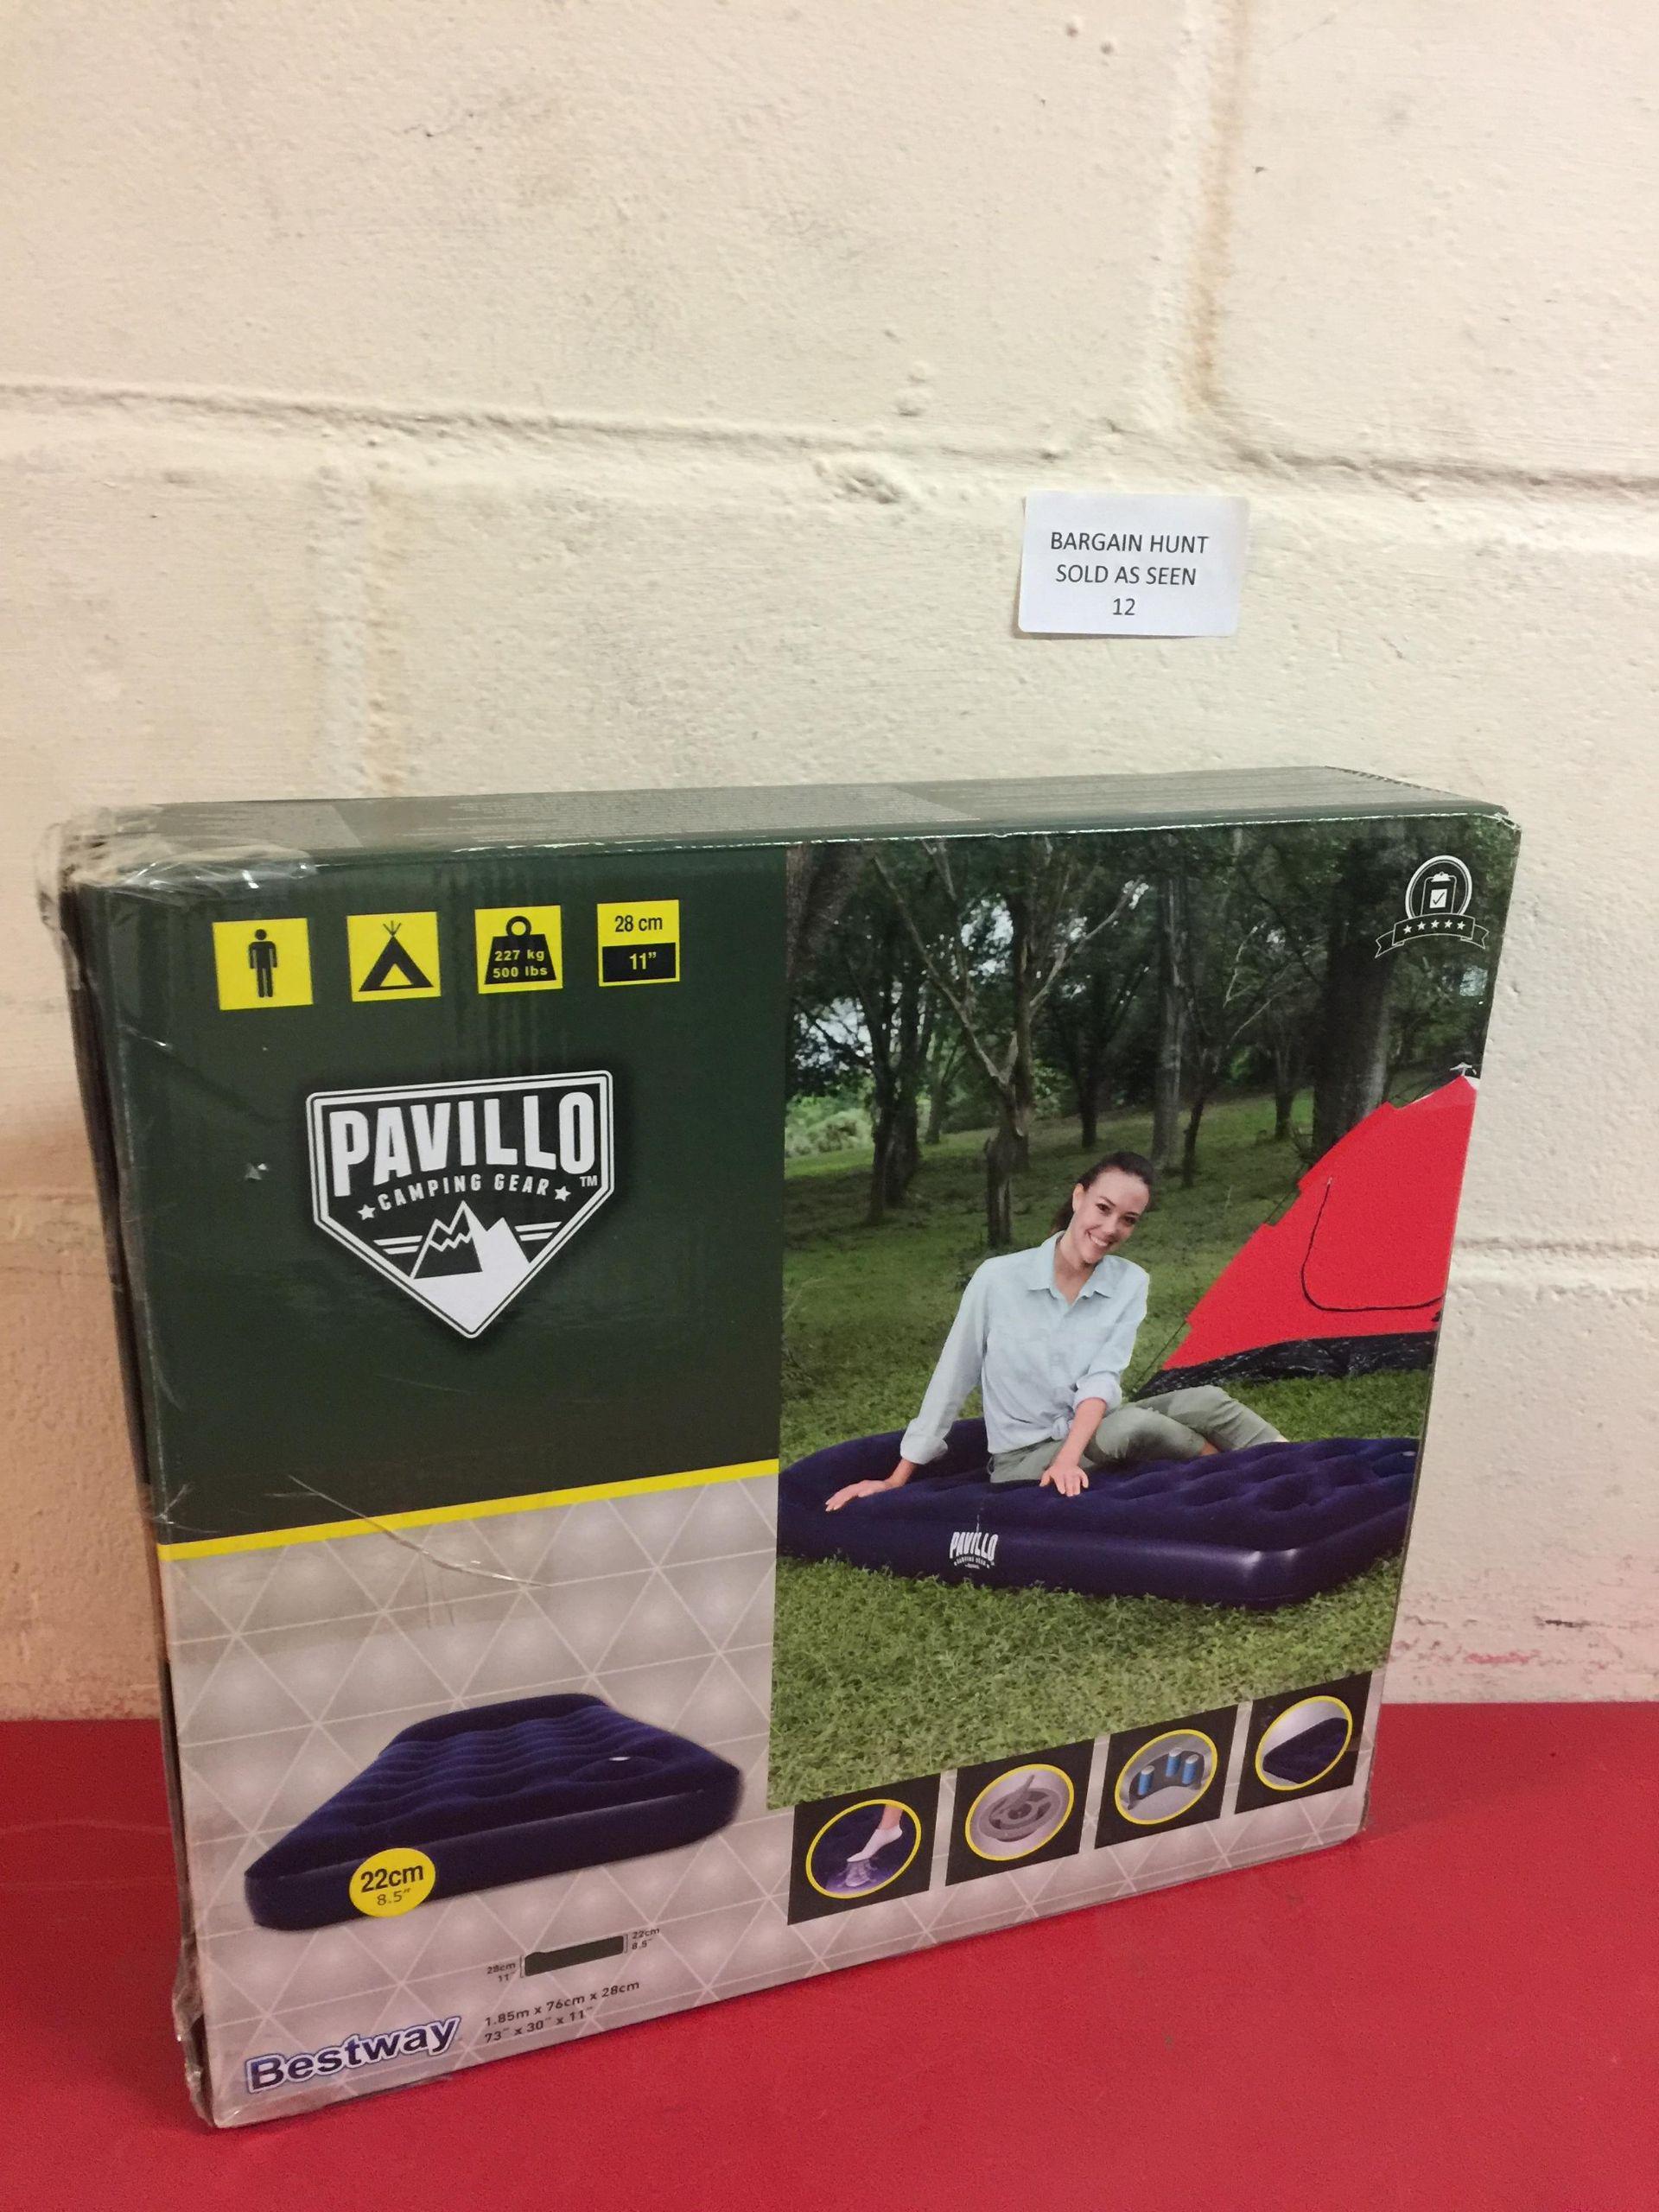 Lot 12 - Bestway Pavillo Air Bed